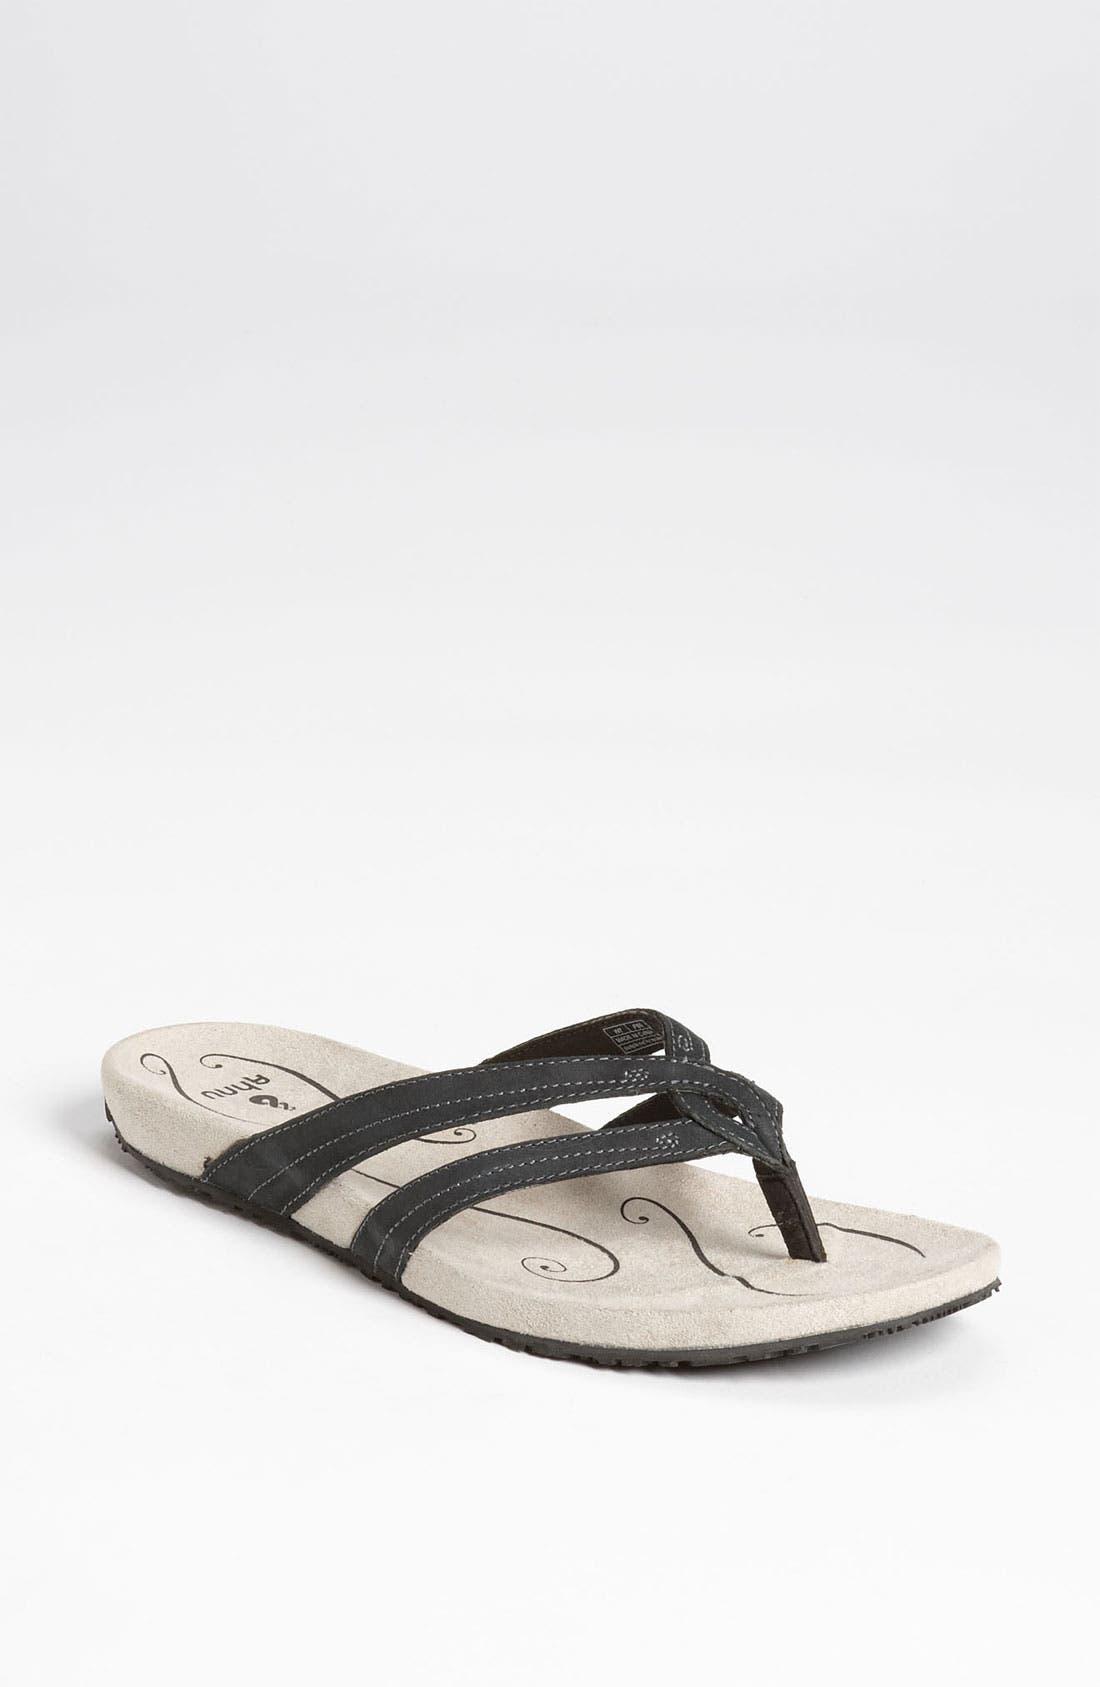 Main Image - Ahnu 'Hanaa' Sandal